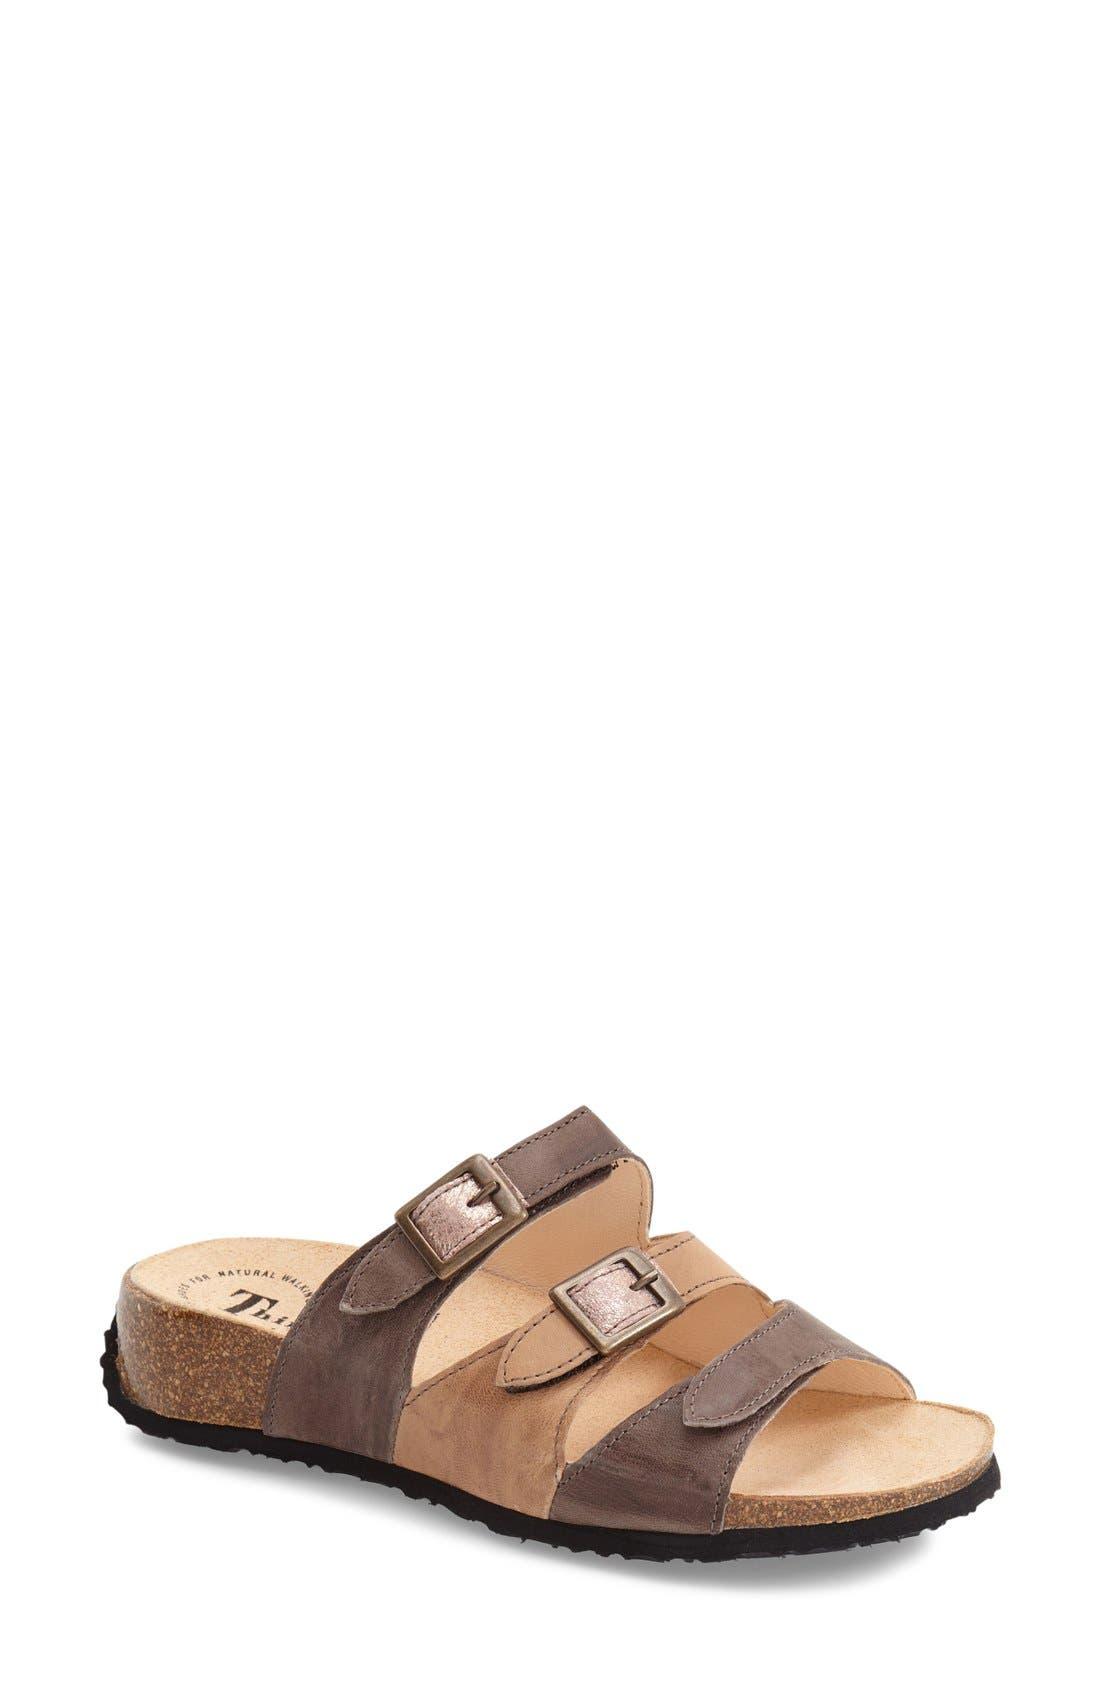 'Mizzi' Sandal,                         Main,                         color, Cappucino Leather